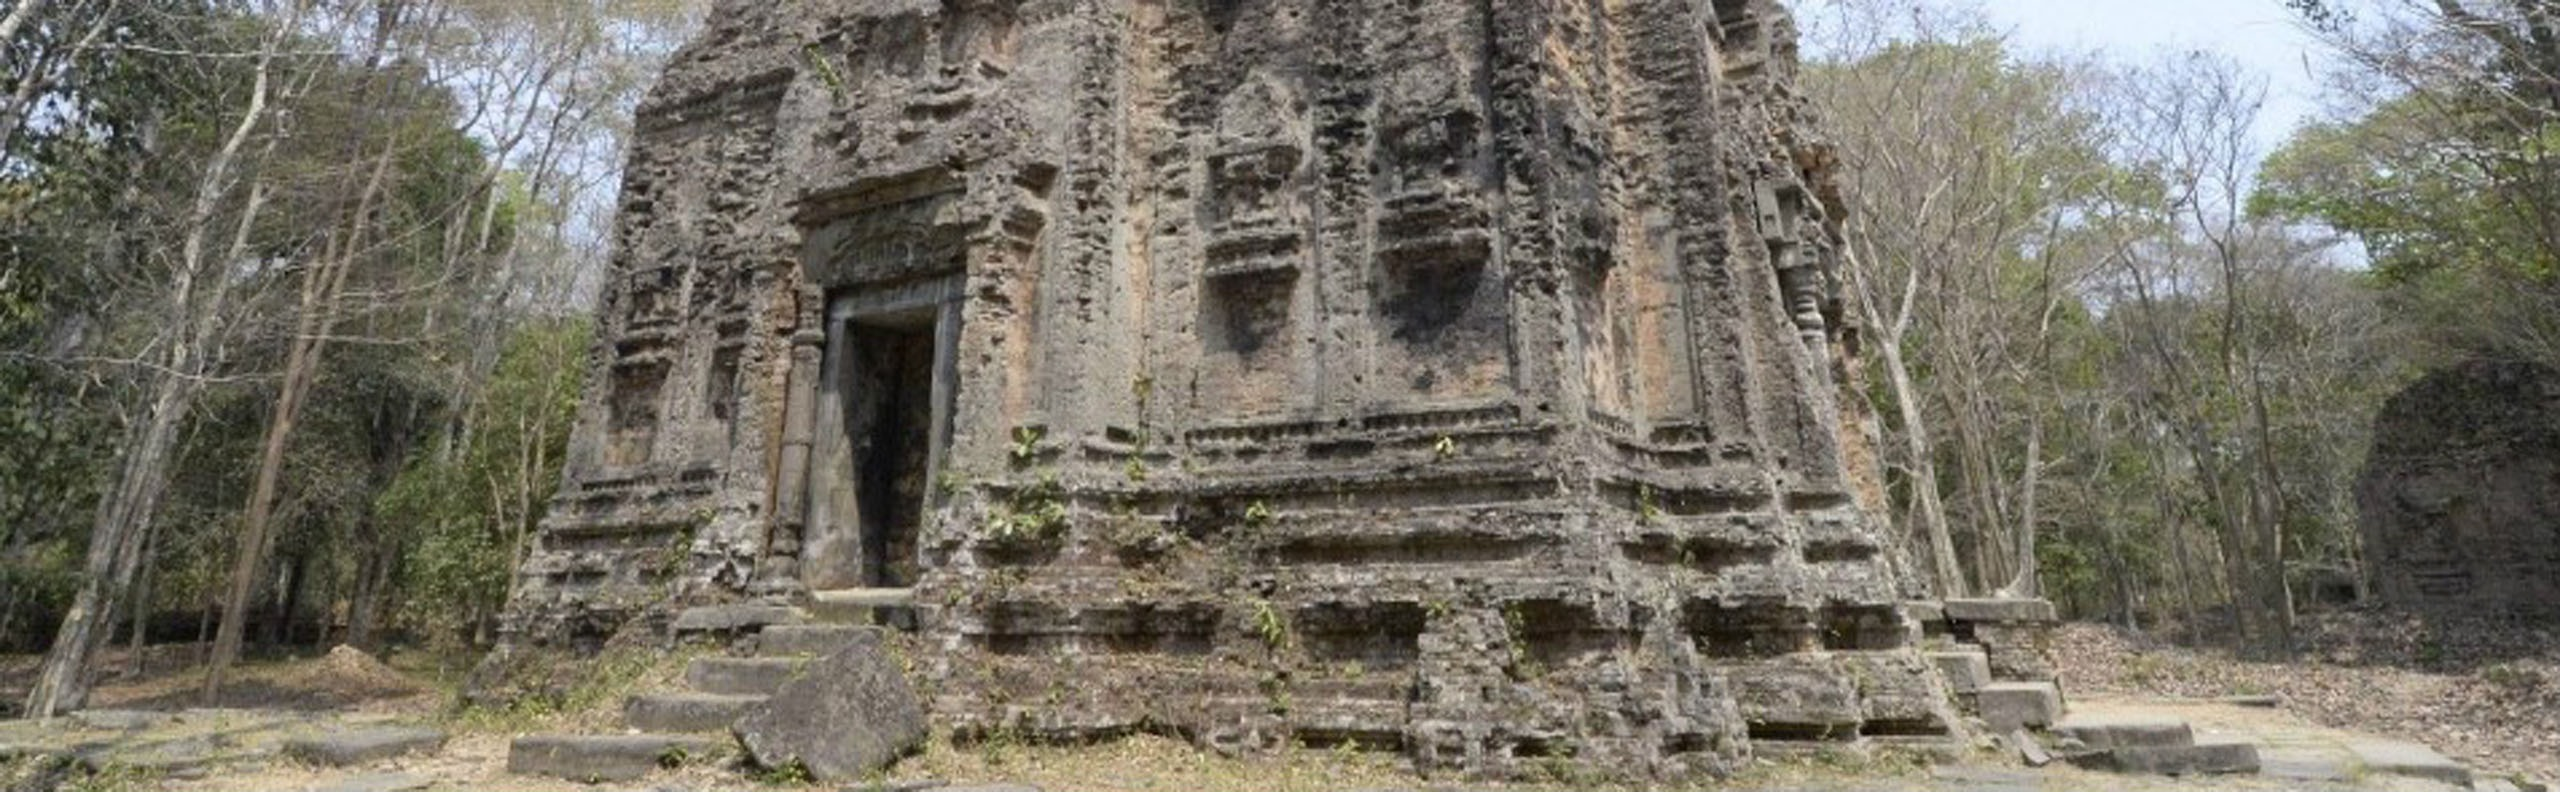 Sambor Prei Kuk Temple, Cambodia